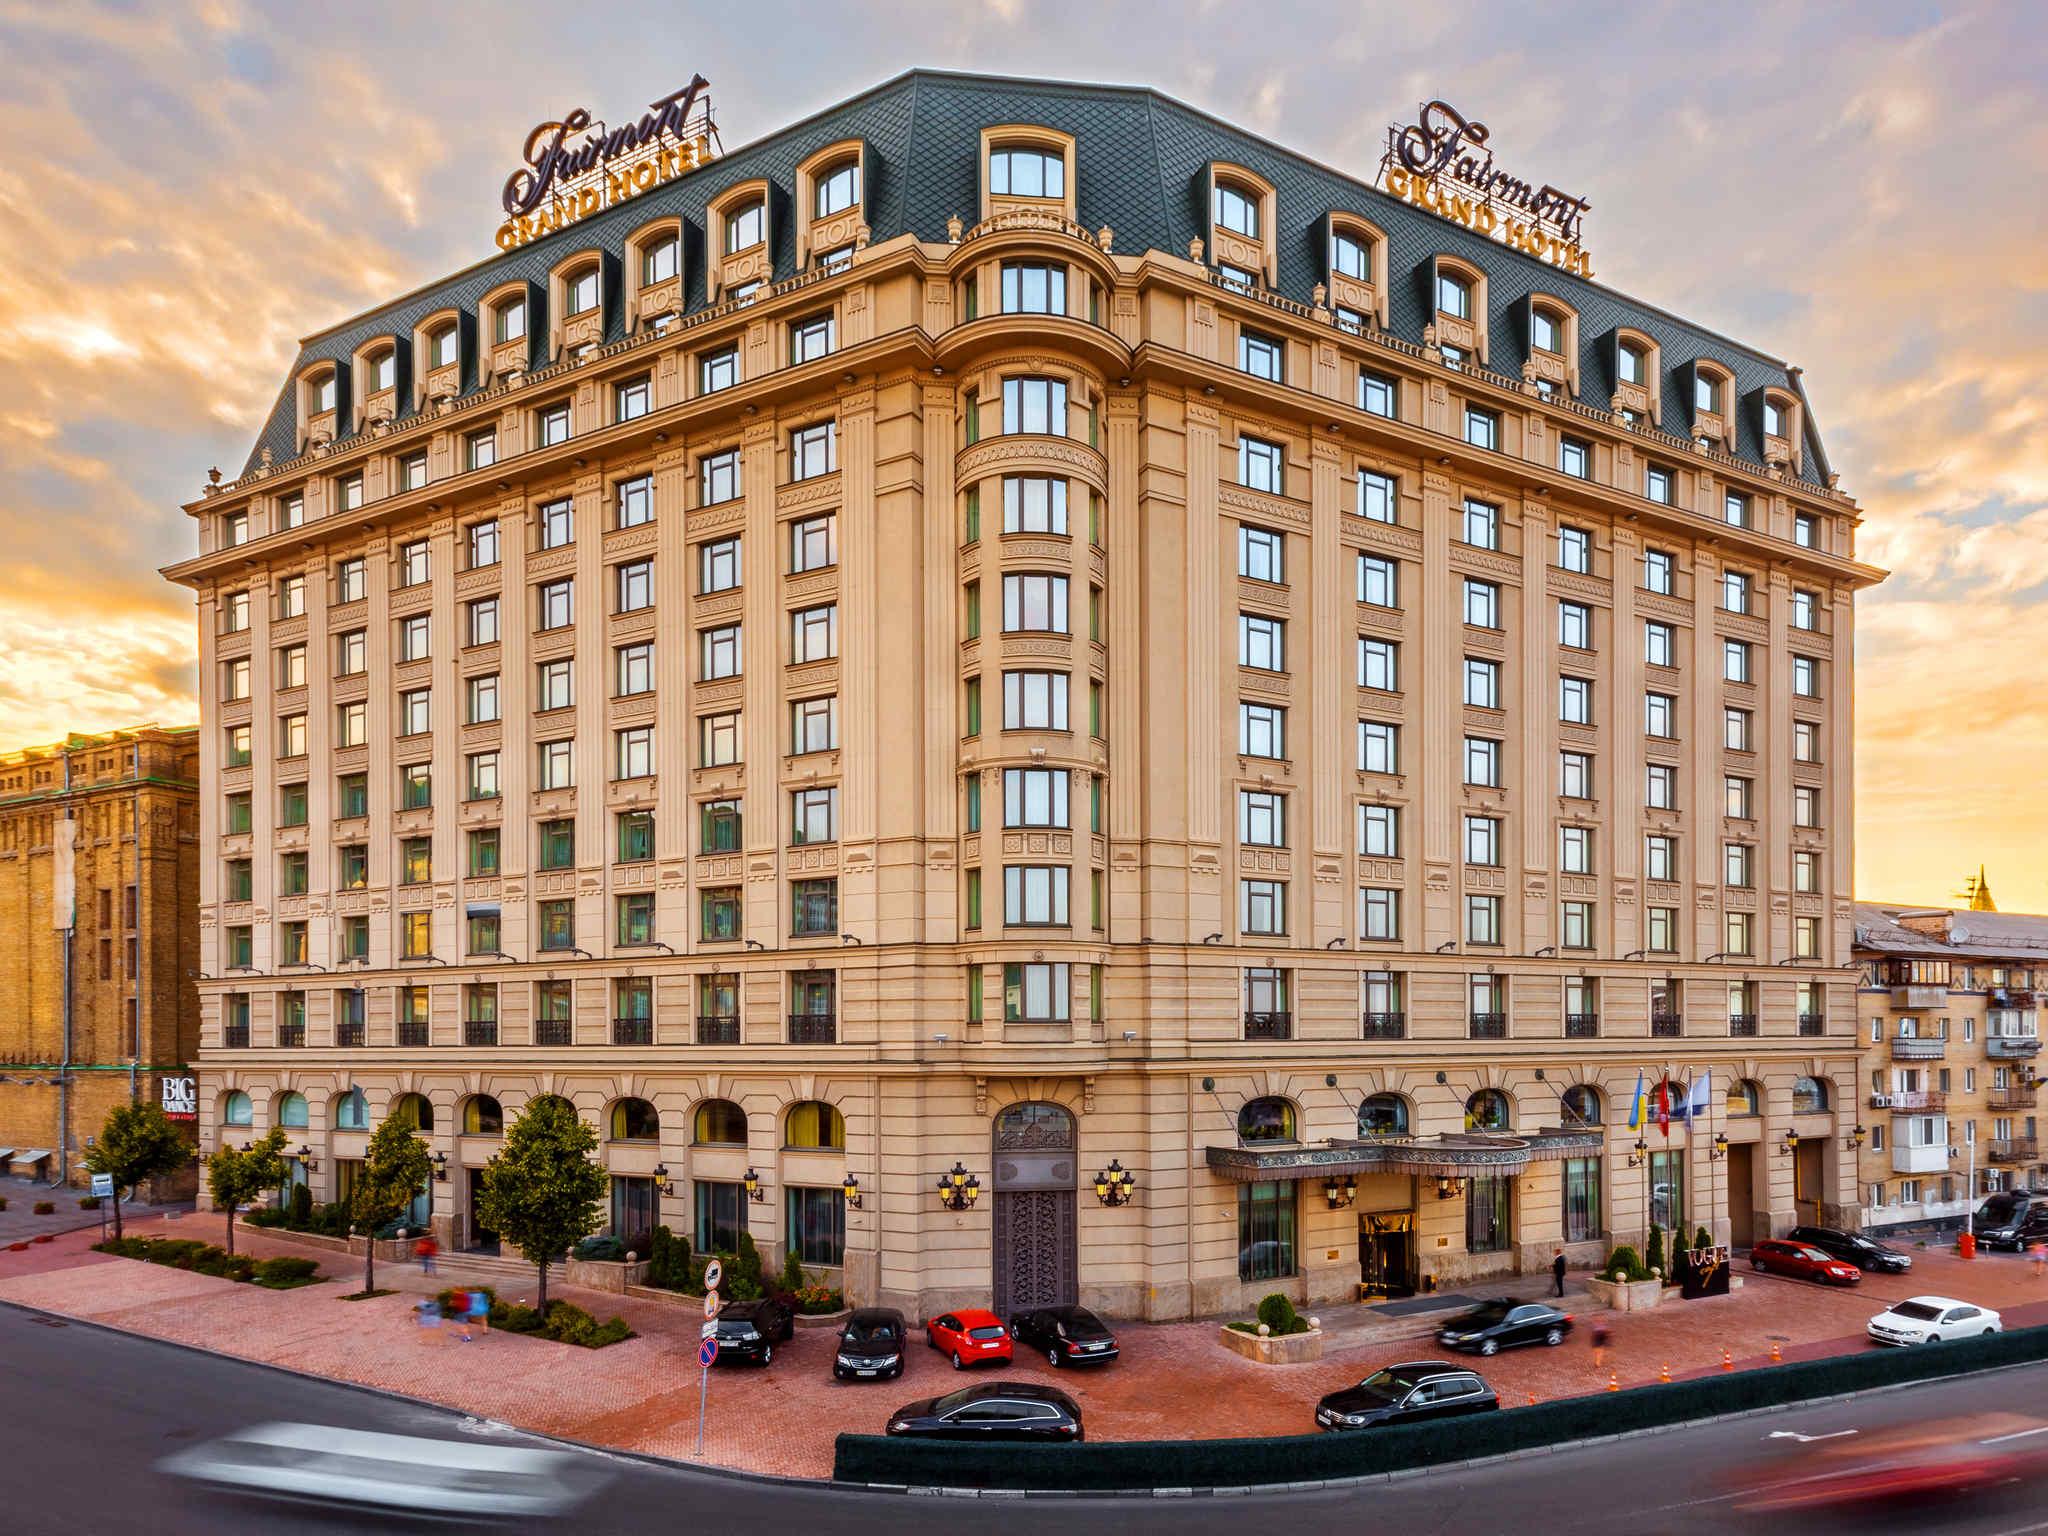 Hotel – Fairmont Grand Hotel - Kyiv